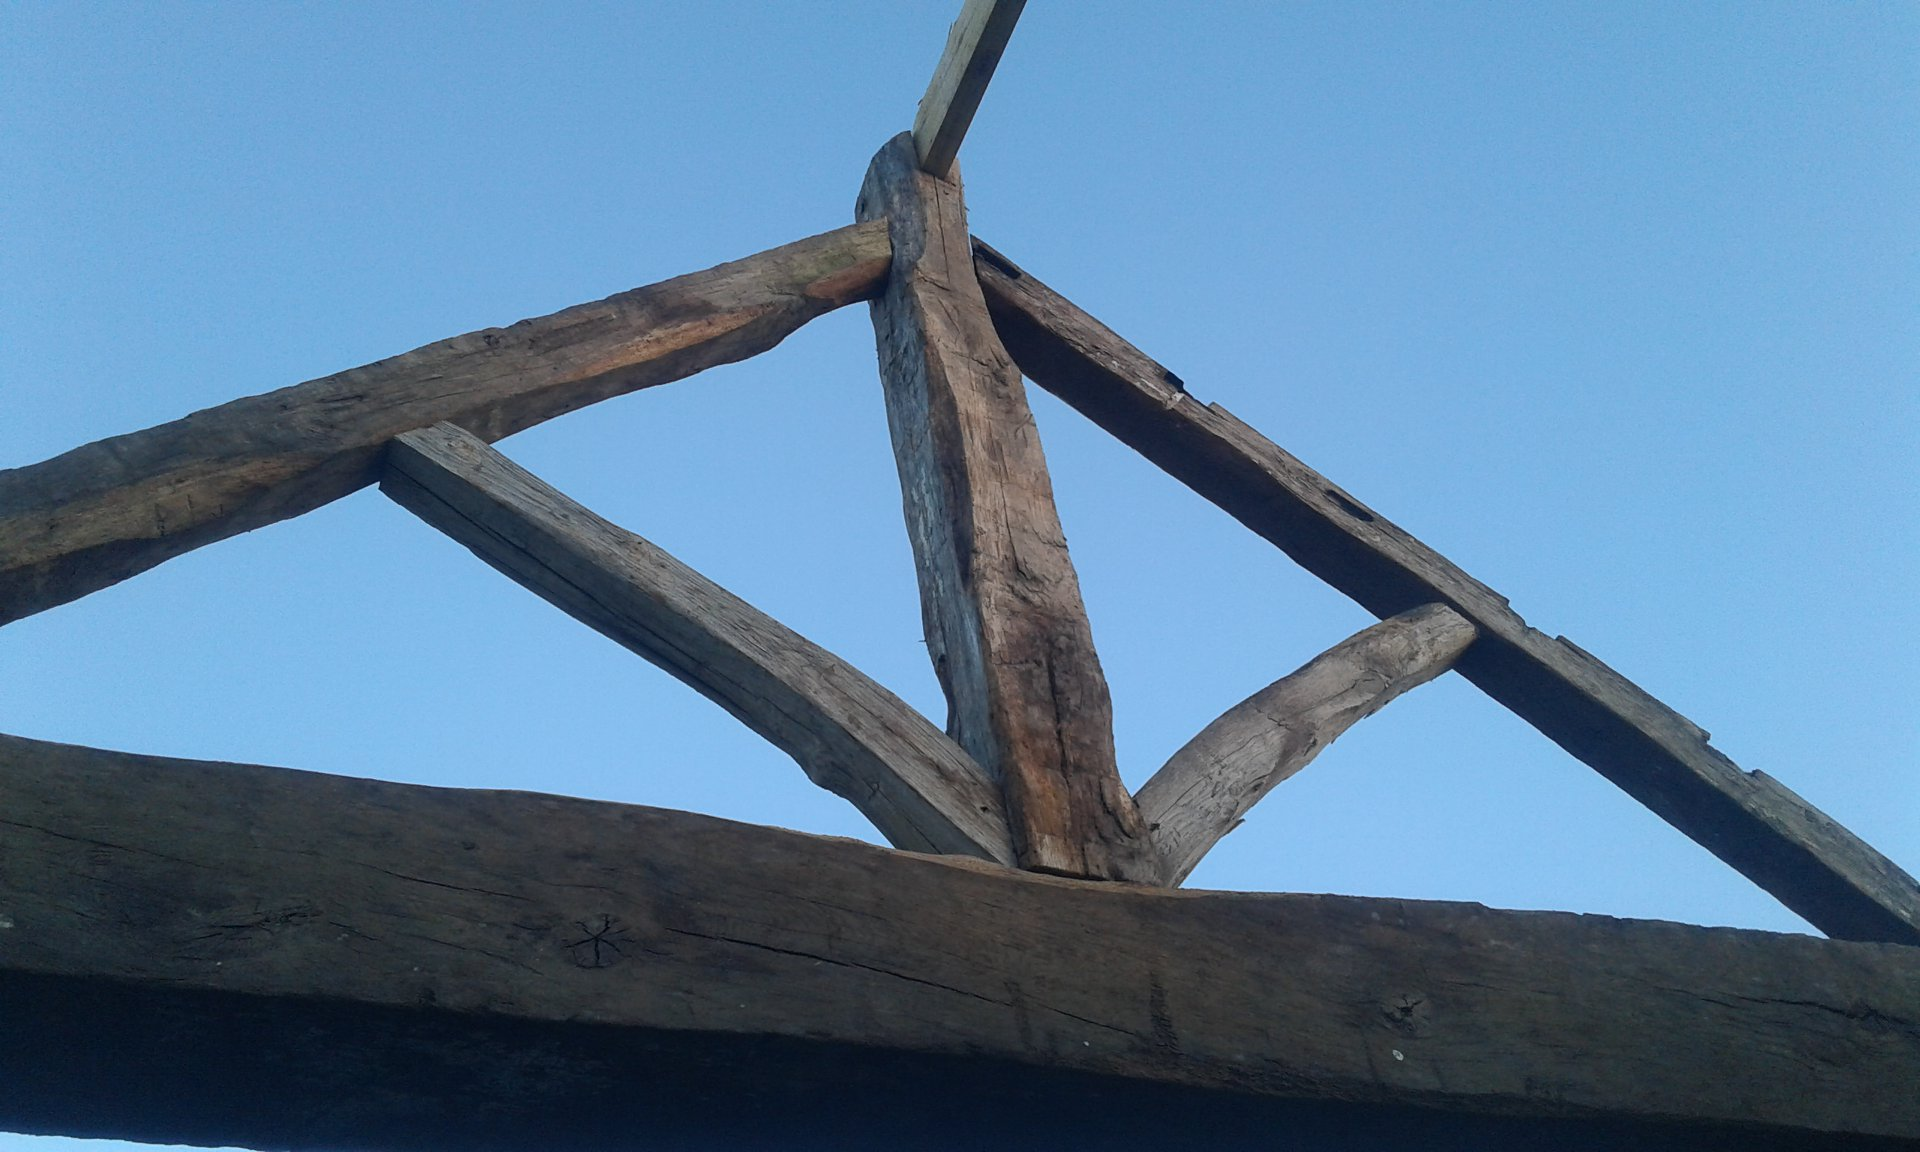 morin-construction-bois-charpente-apparente-tierce